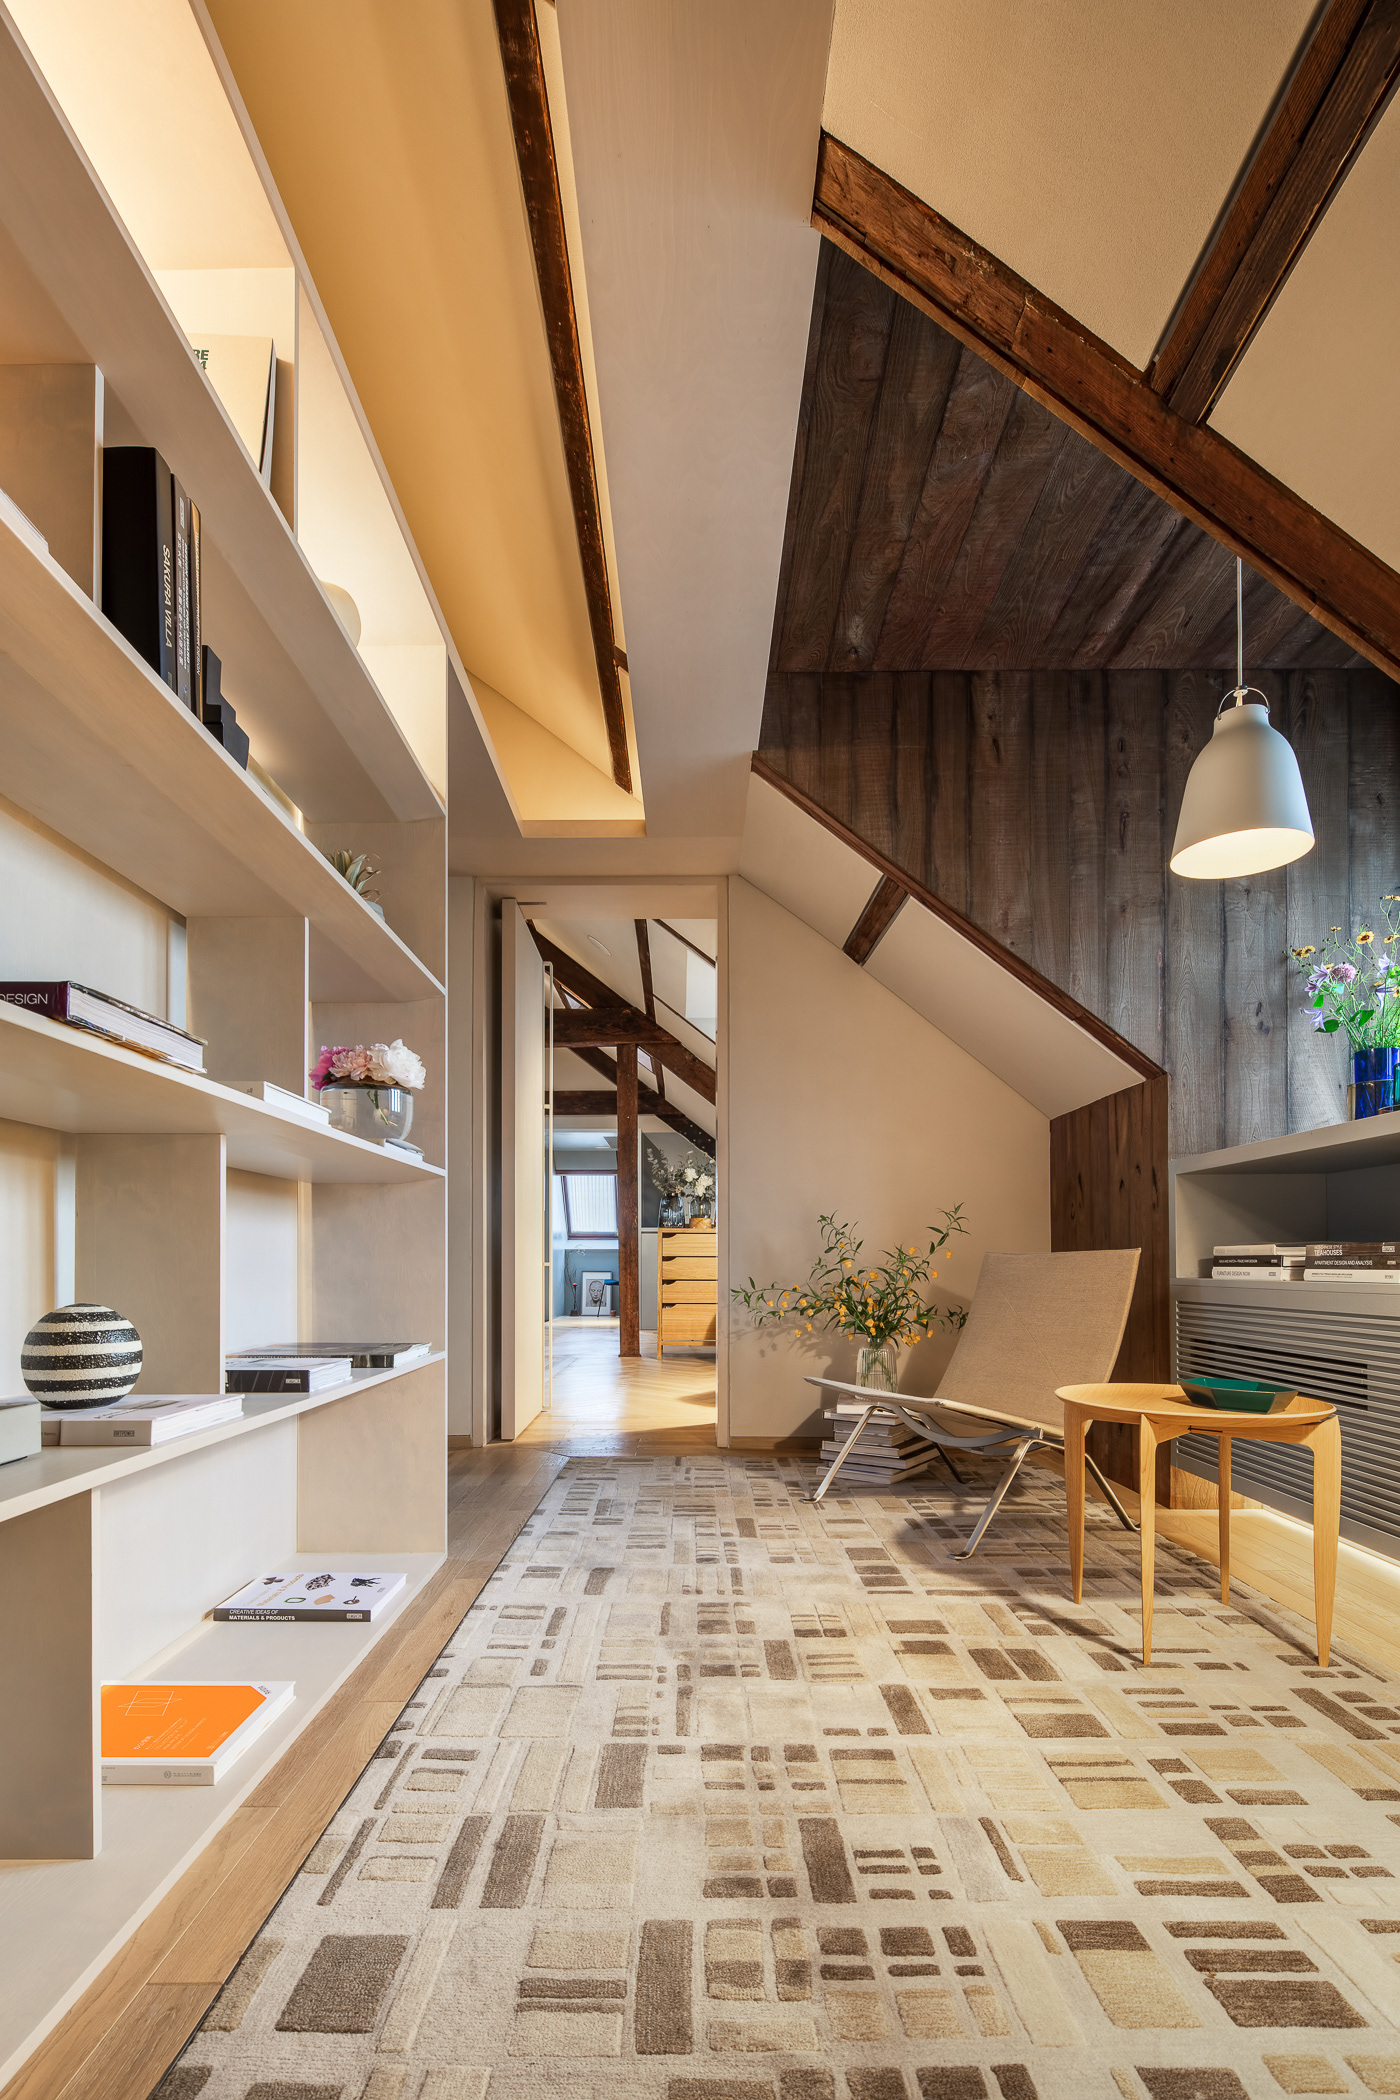 Fritz Hansen Lounge -2F & 3F on Behance